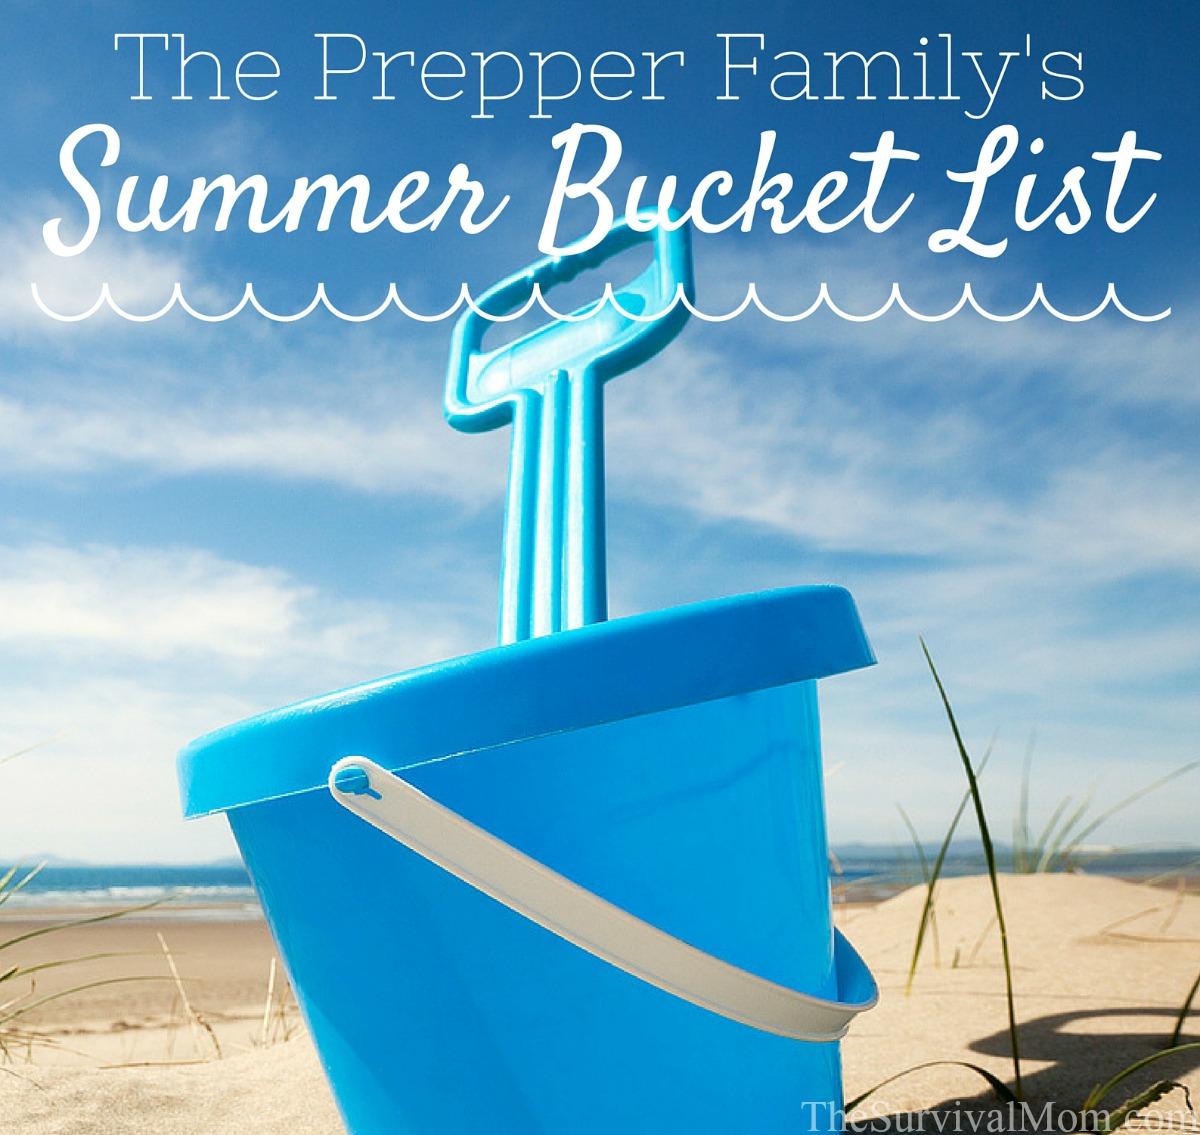 The Prepper Family's Summer Bucket List via The Survival Mom